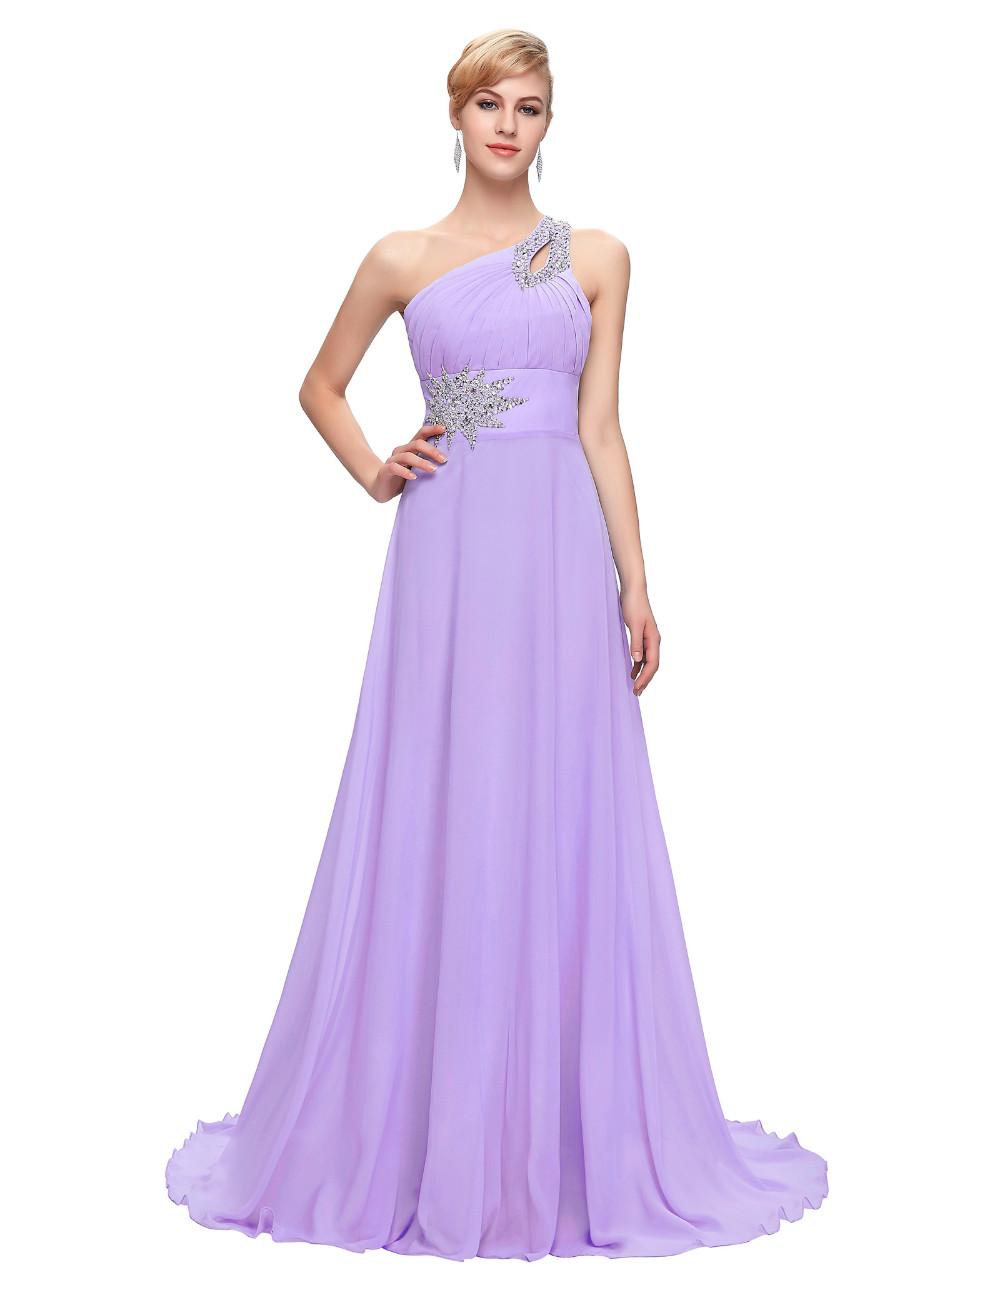 Elegant One Shoulder Long Bridesmaid Dress 18